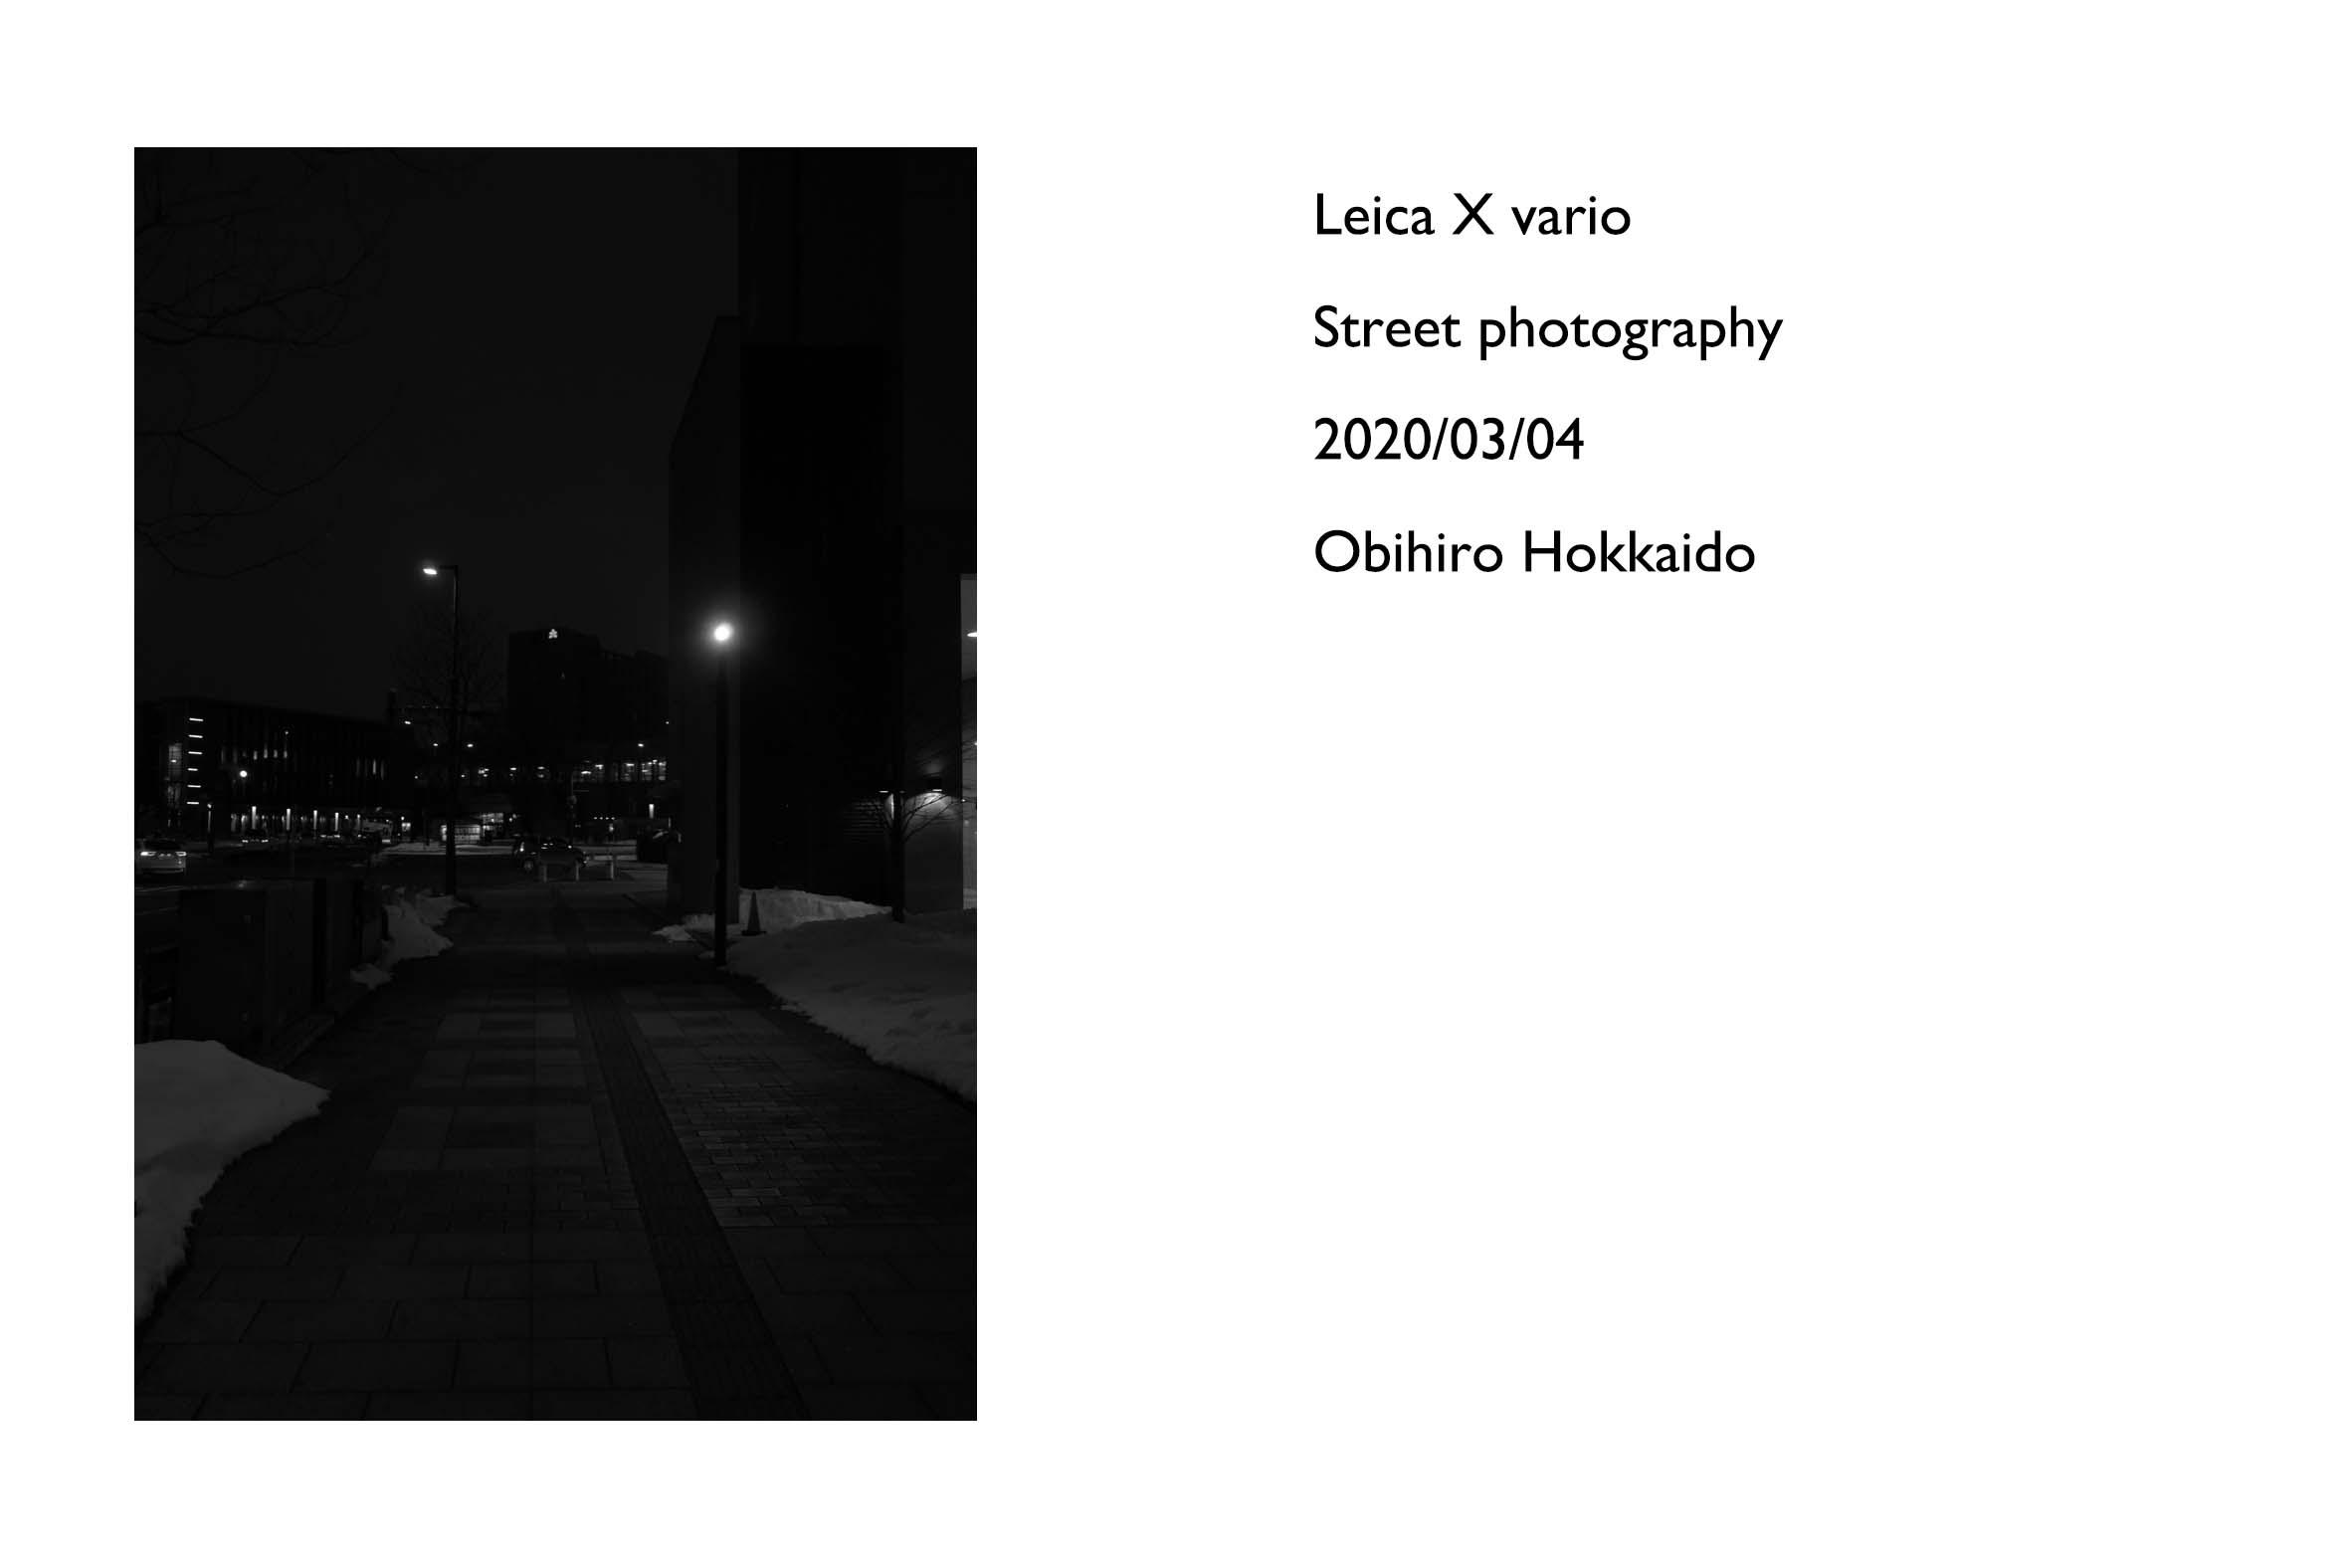 Leica X vario でストリートフォトをやってみた